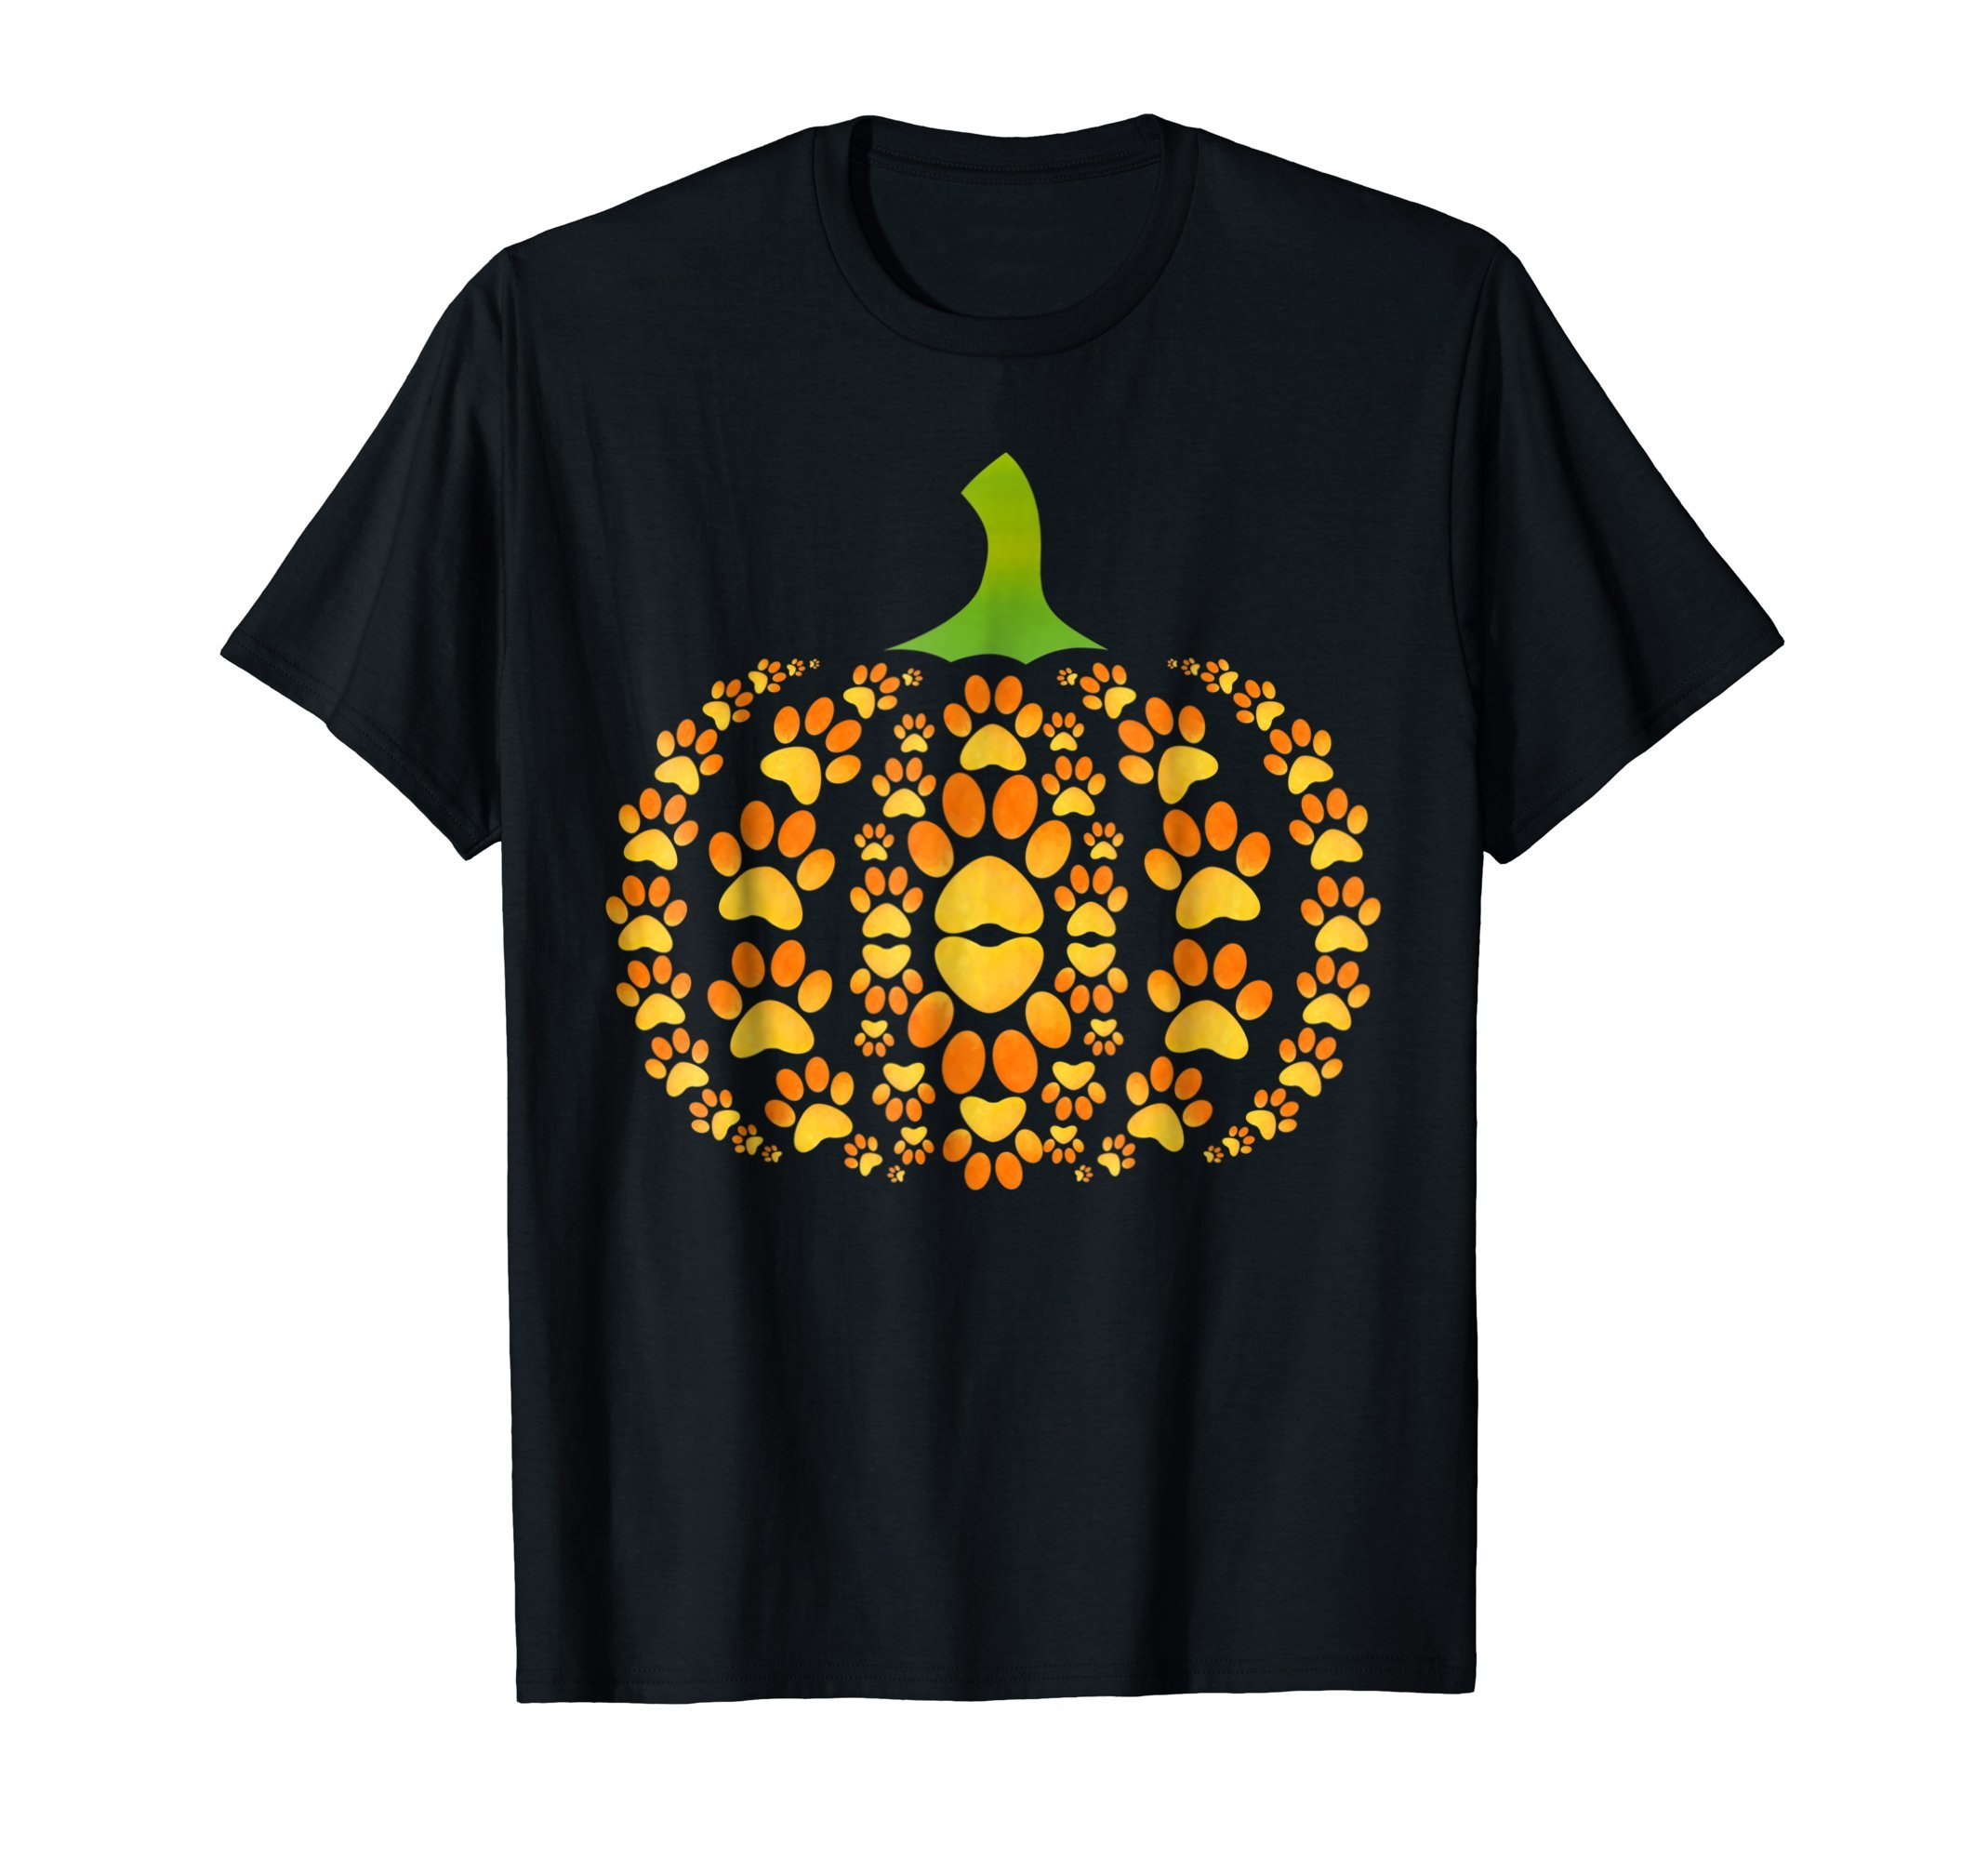 Funny Pumpkin Dog Cat Paw Halloween T-Shirt Pet Lover by Dog Paw Halloween Tshirt for Men Women Kids